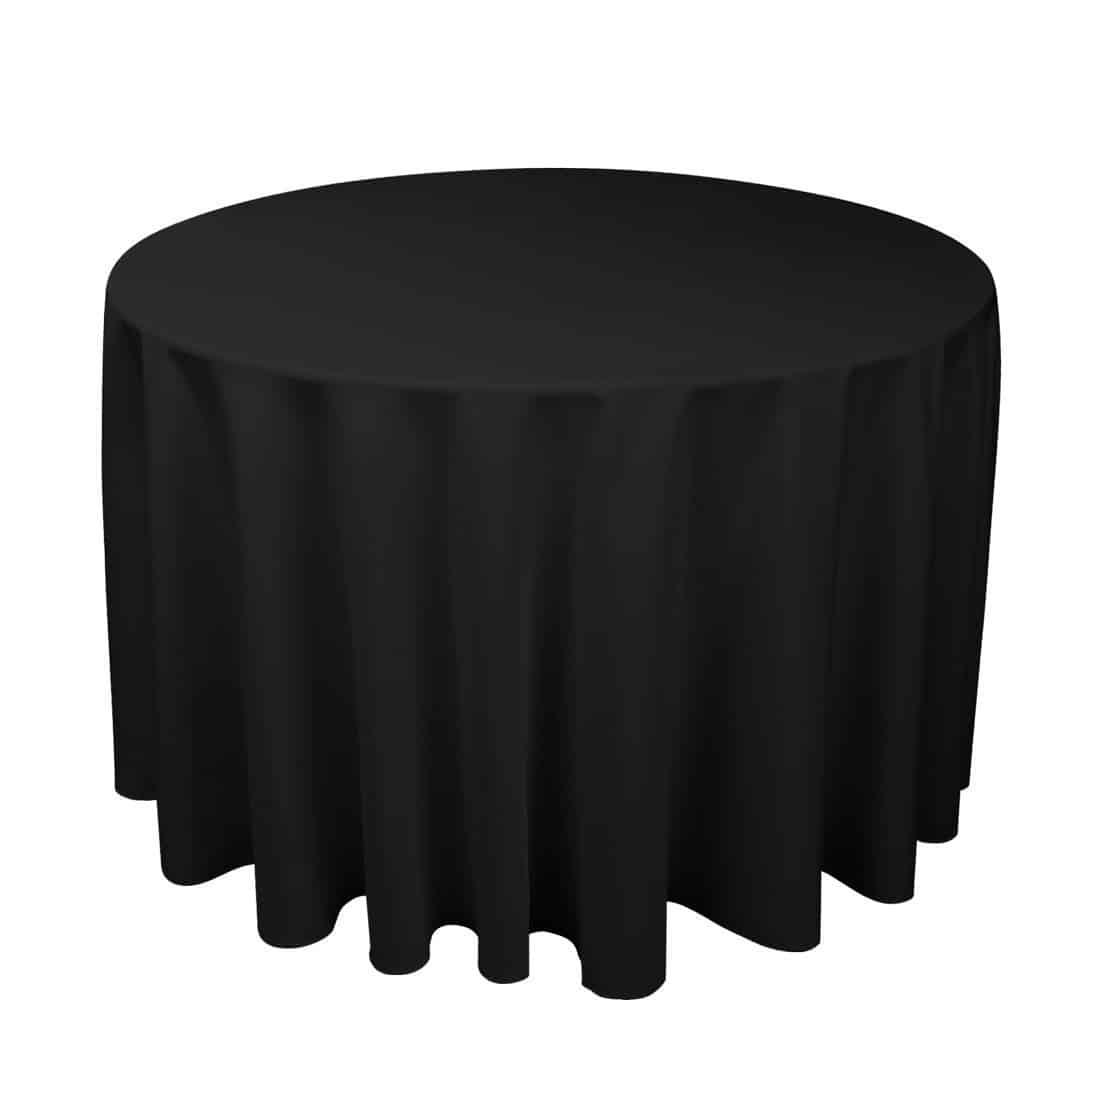 Black Circular Table Cloth